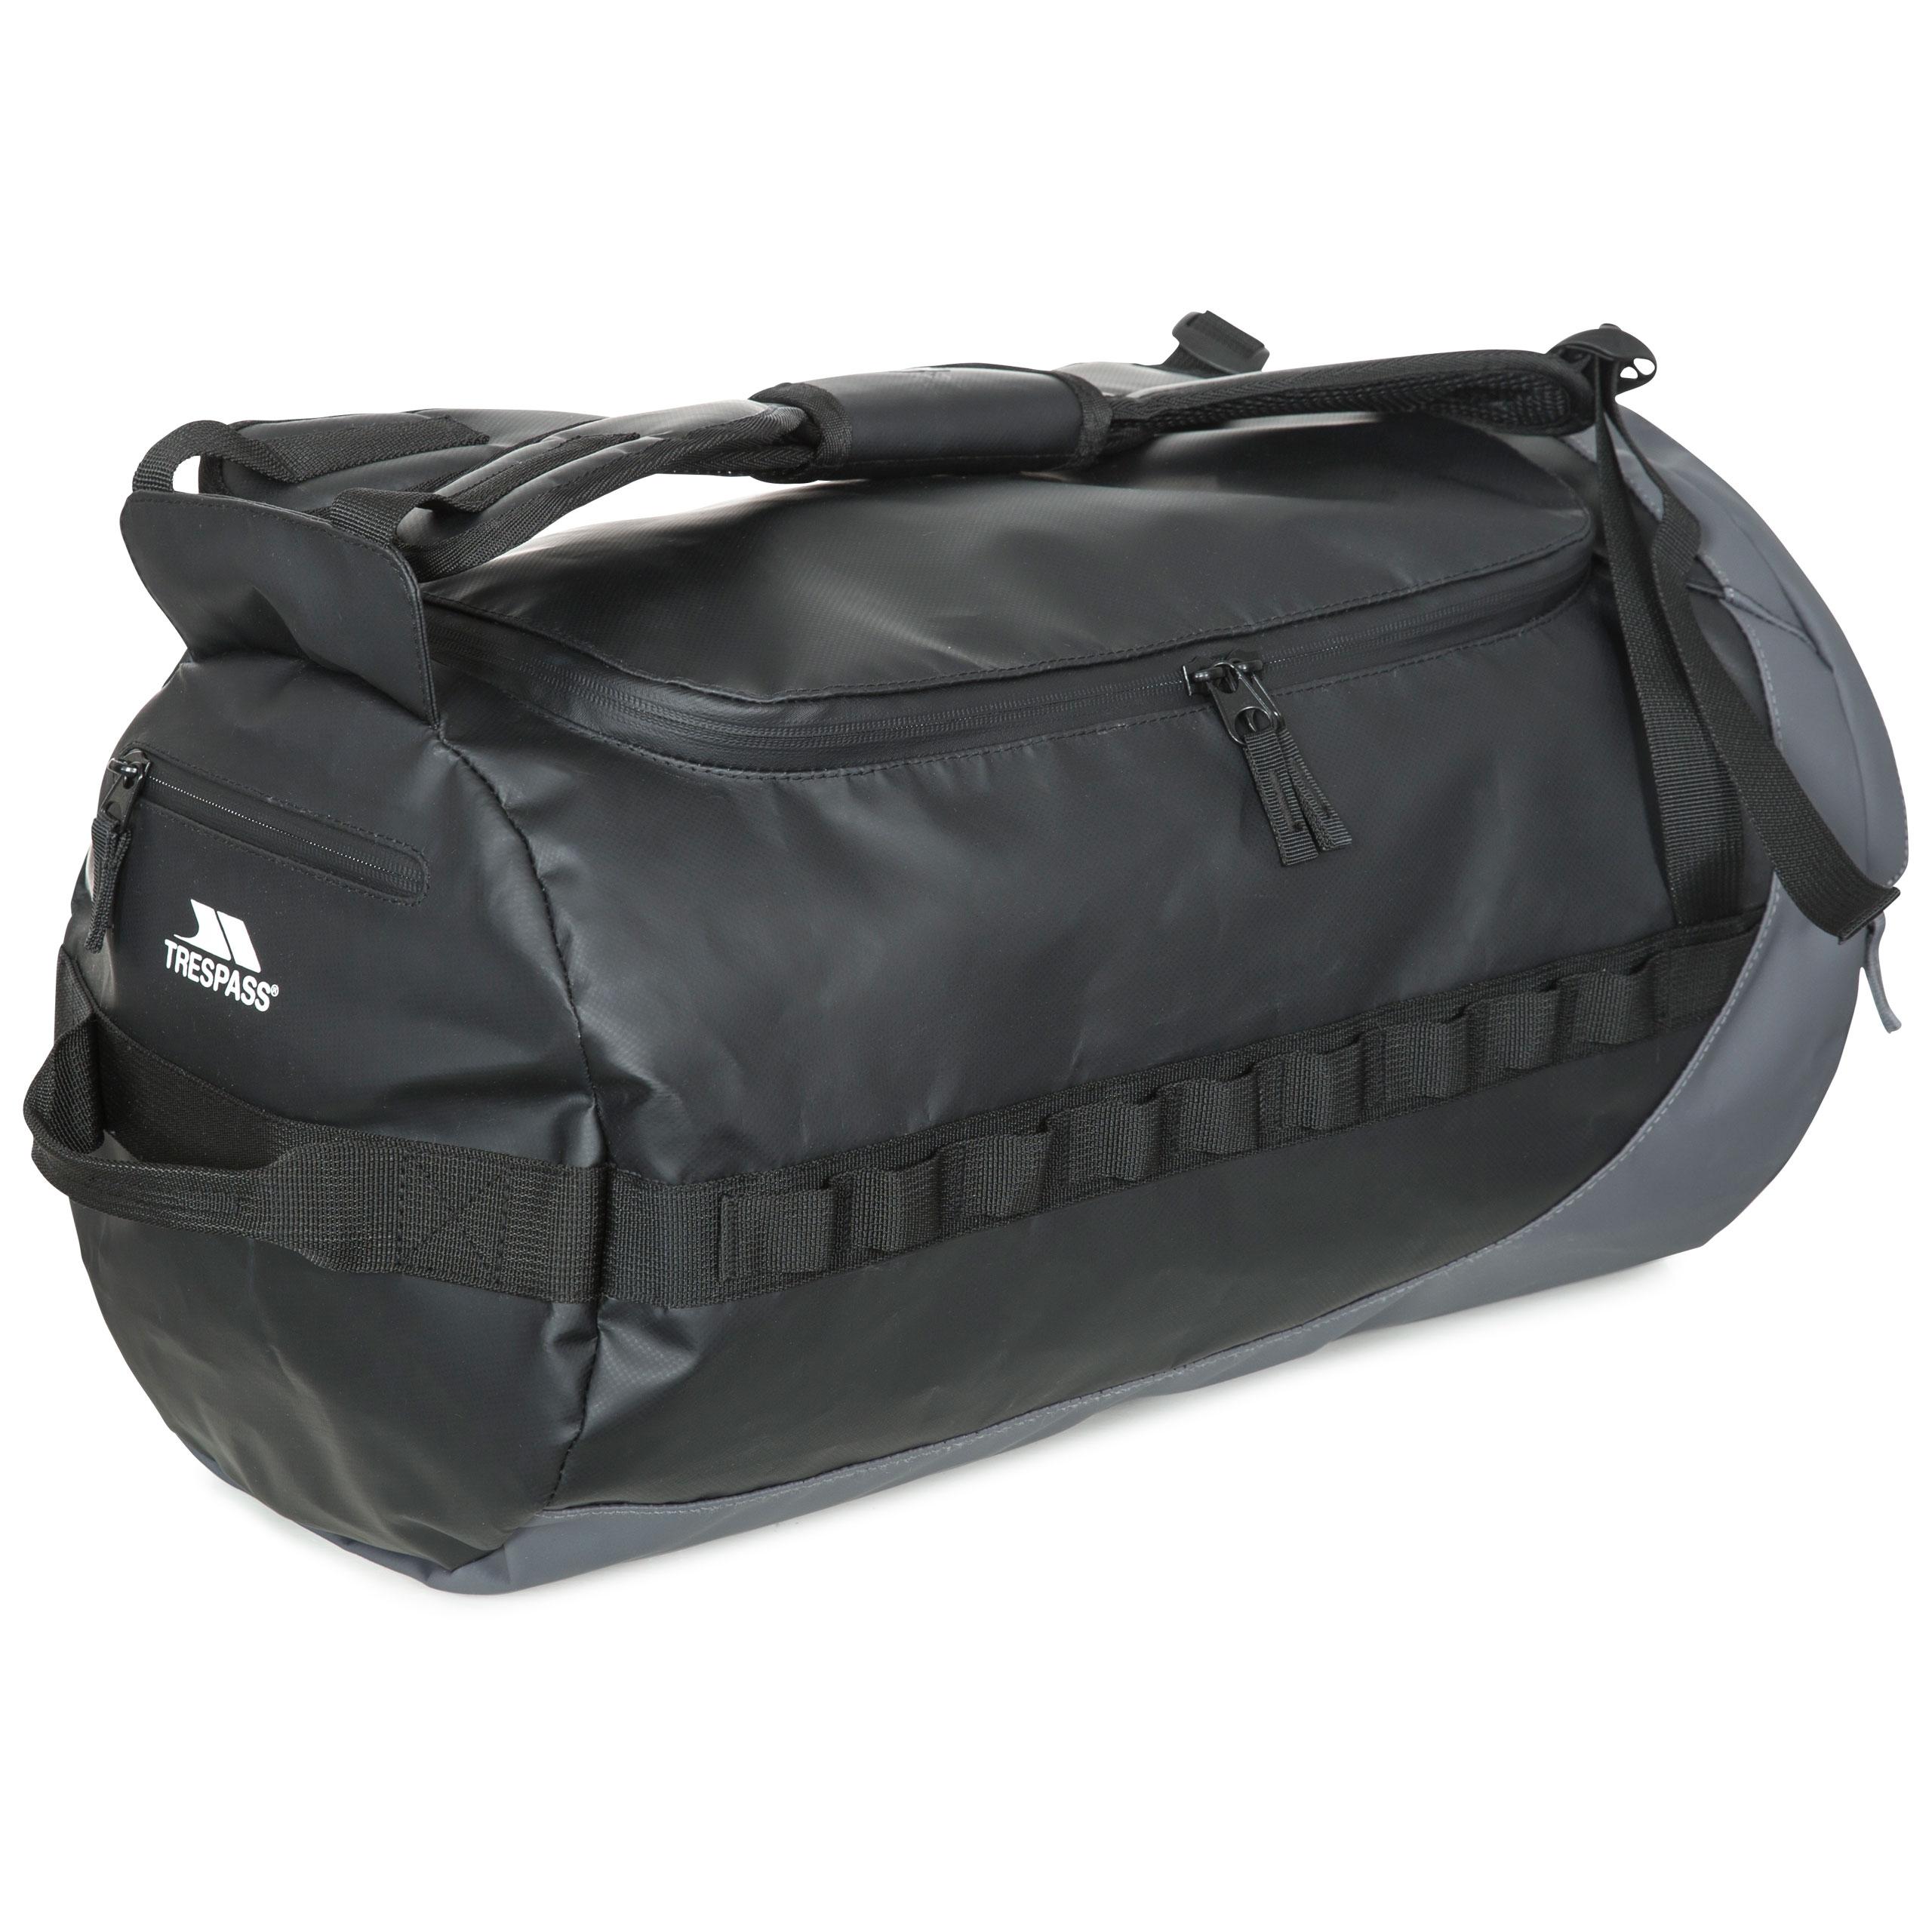 Blackfriar 40 Litre Waterproof Duffle Bag